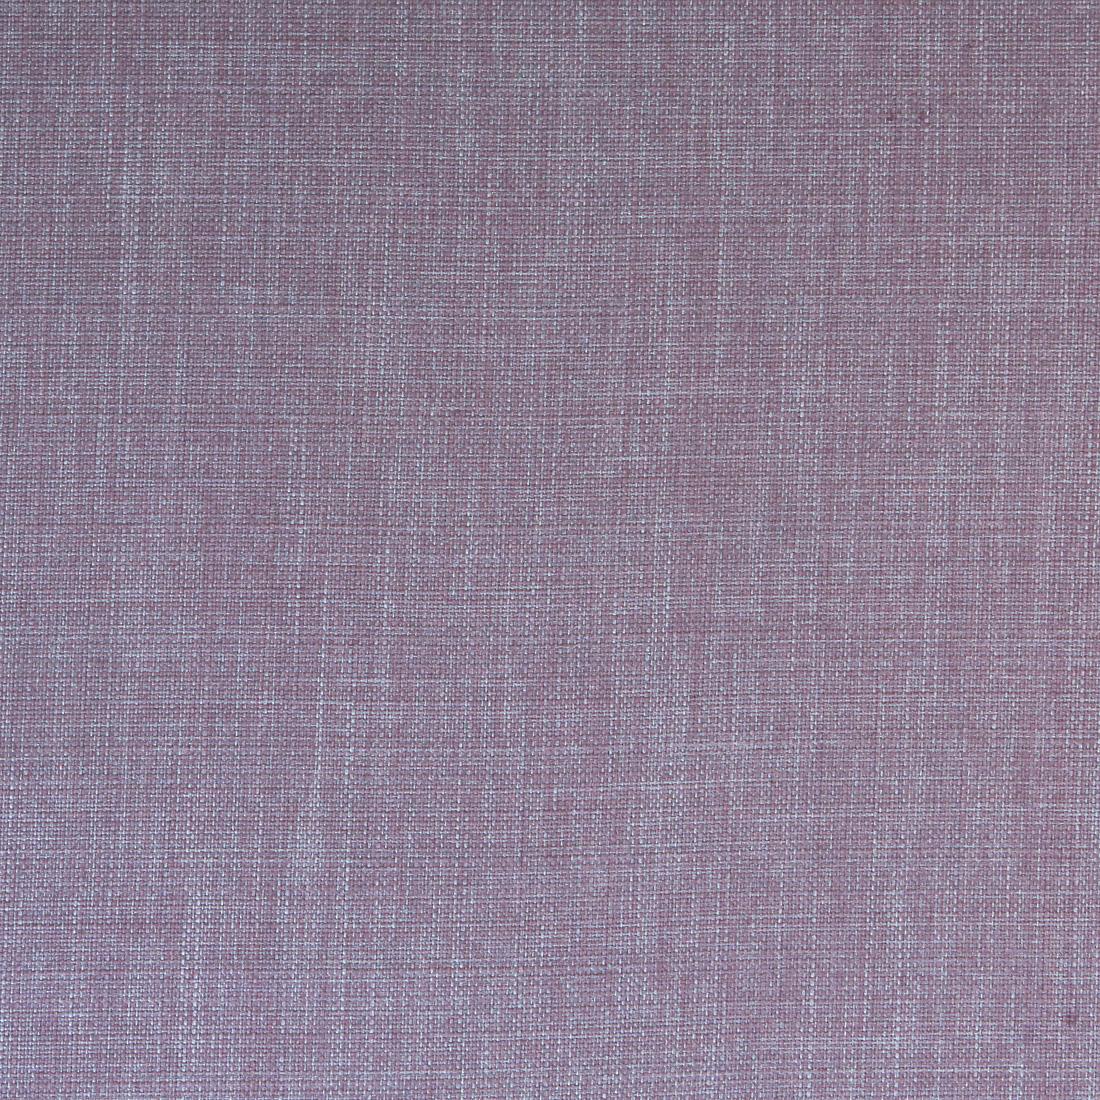 Linoso Heather Upholstery Fabric